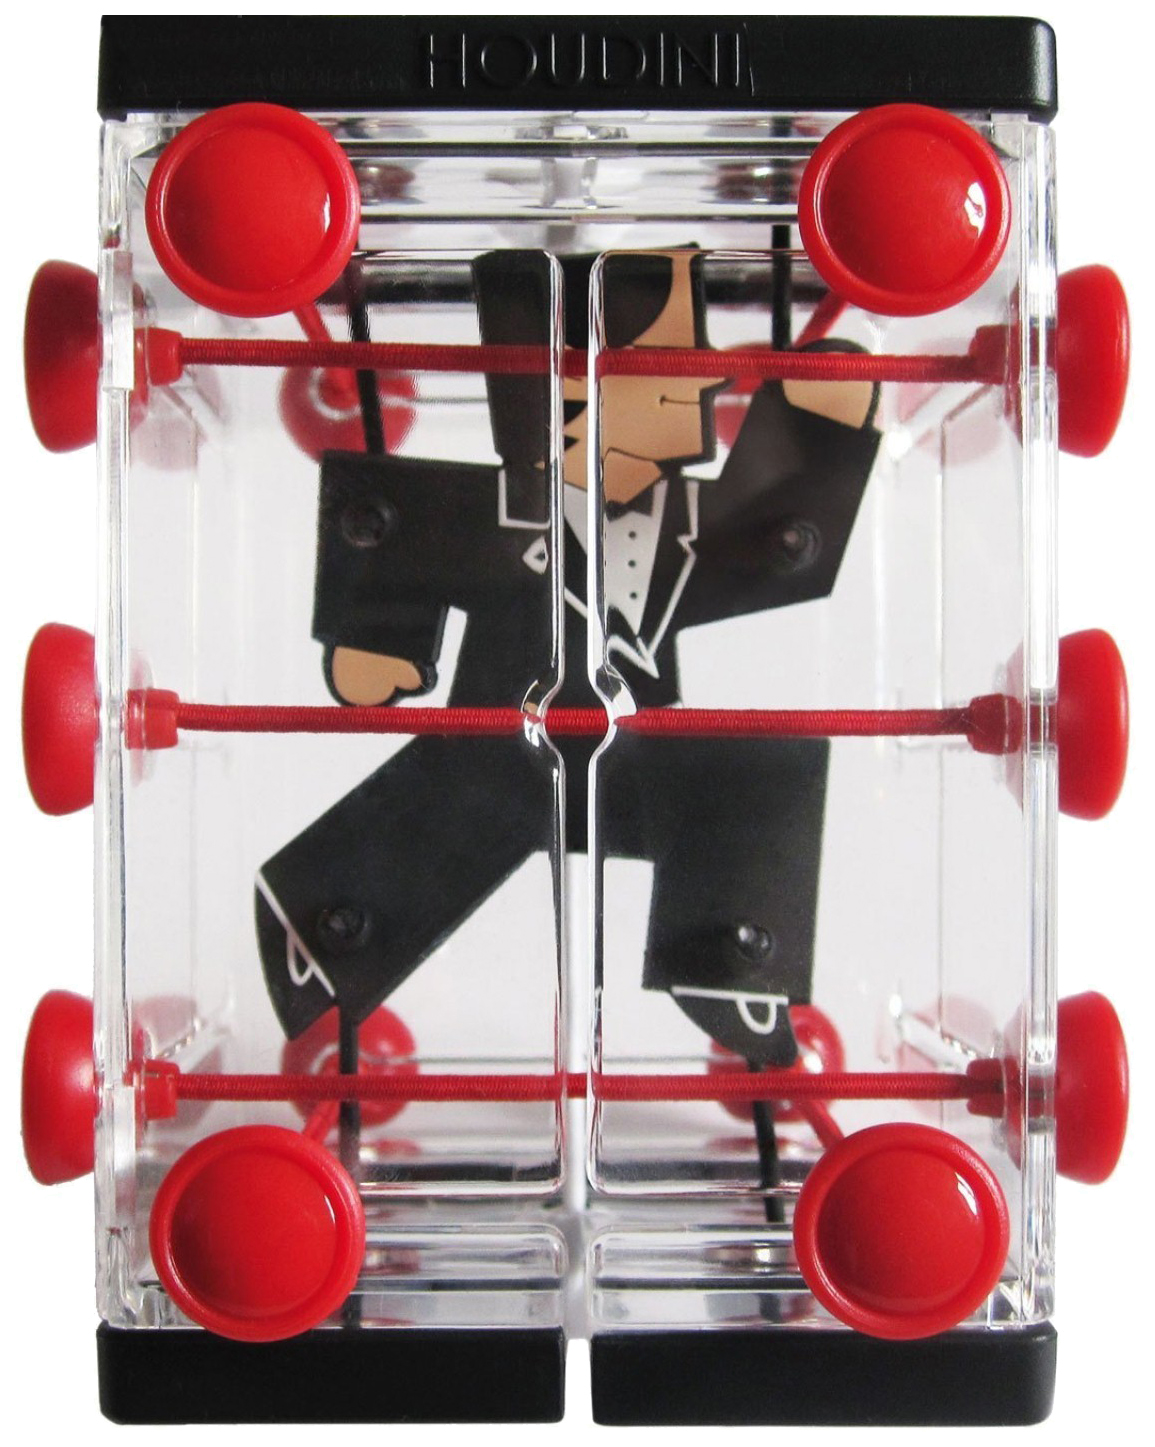 Купить Головоломка Узел Гудини RT66 Rubik's,